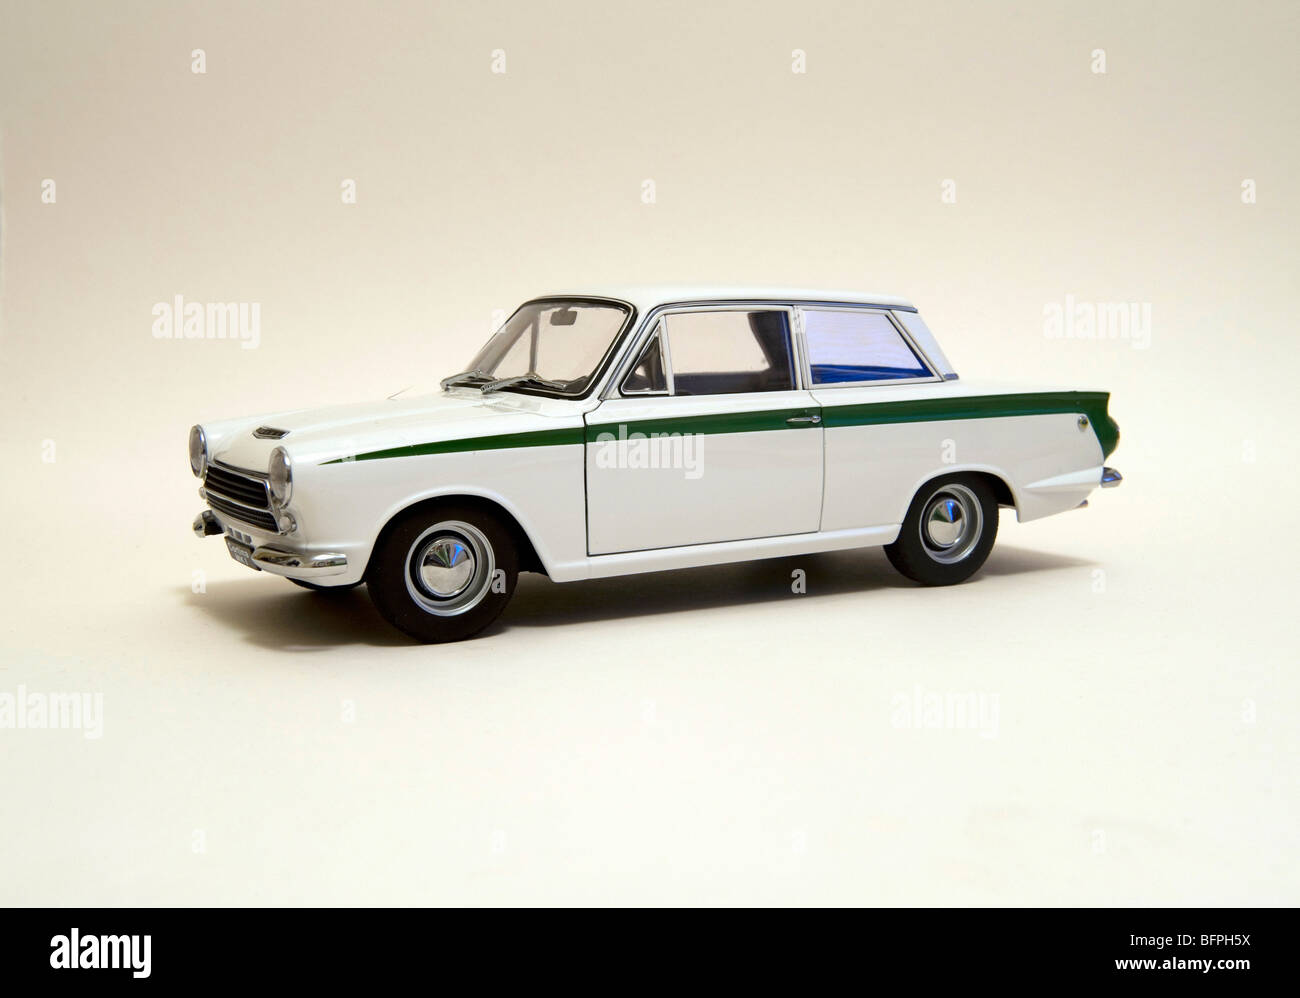 LOTUS FORD CORTINA MK1 WHITE/GREEN MODEL CAR Stock Photo, Royalty Free ...